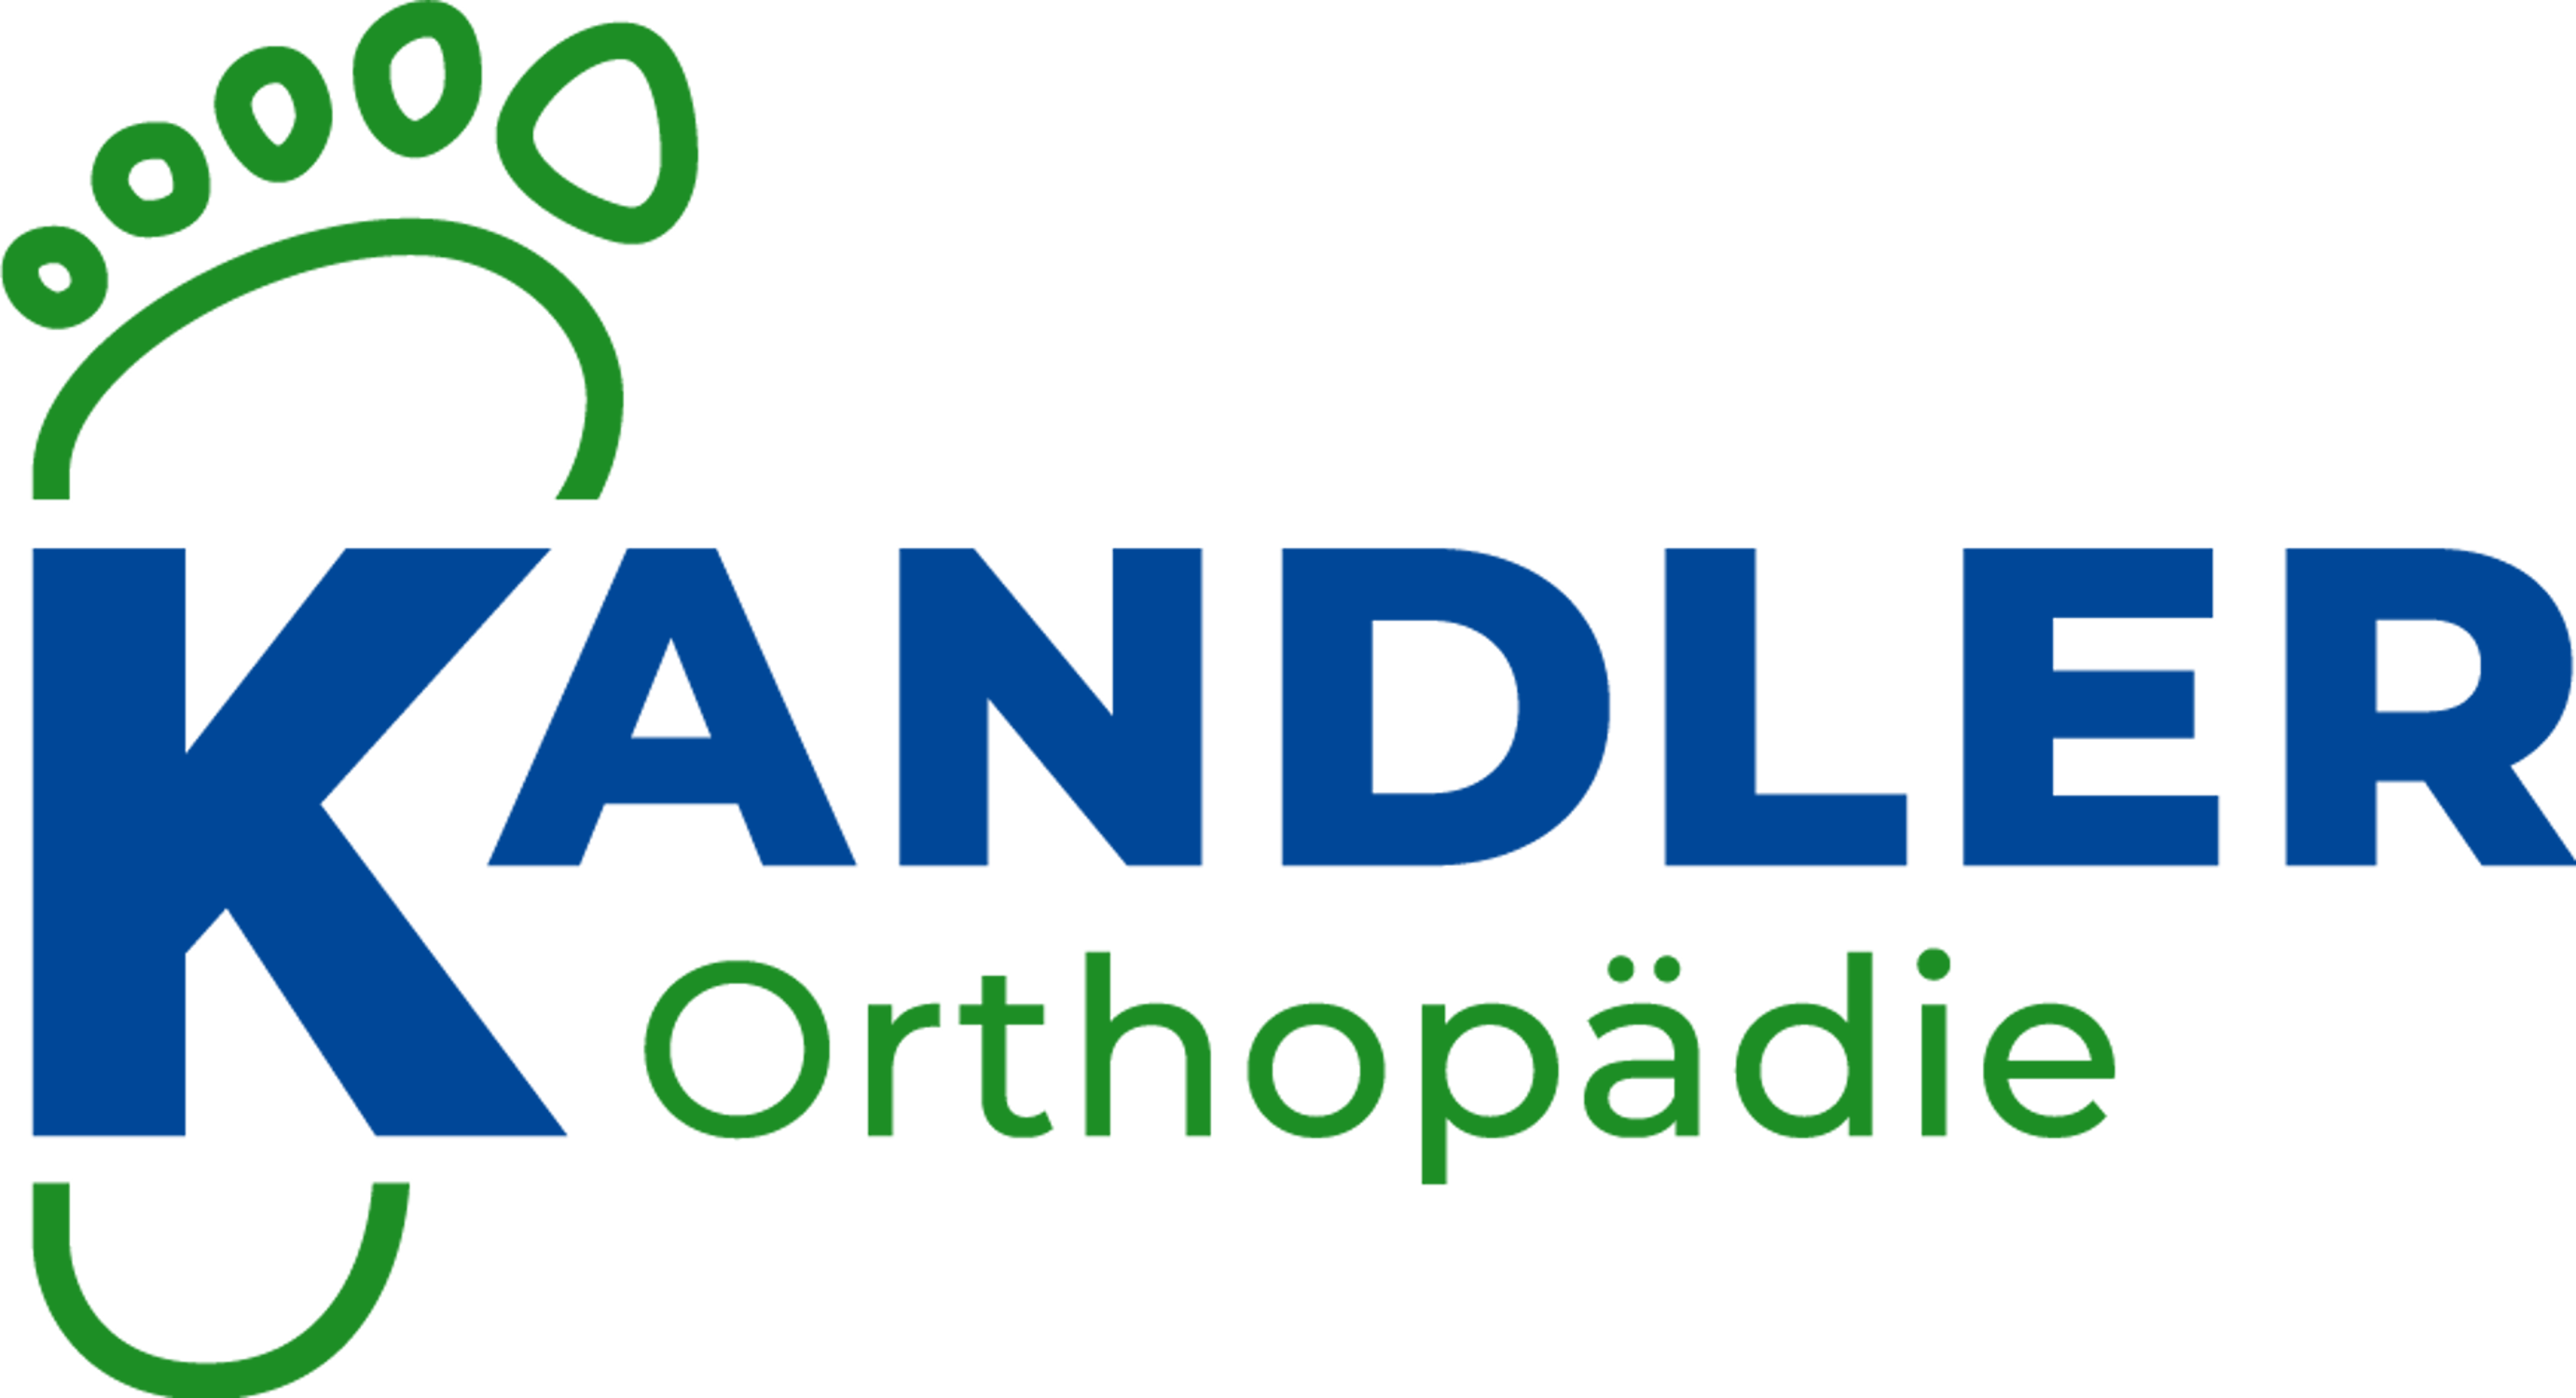 Kandler Orthopädie Logo